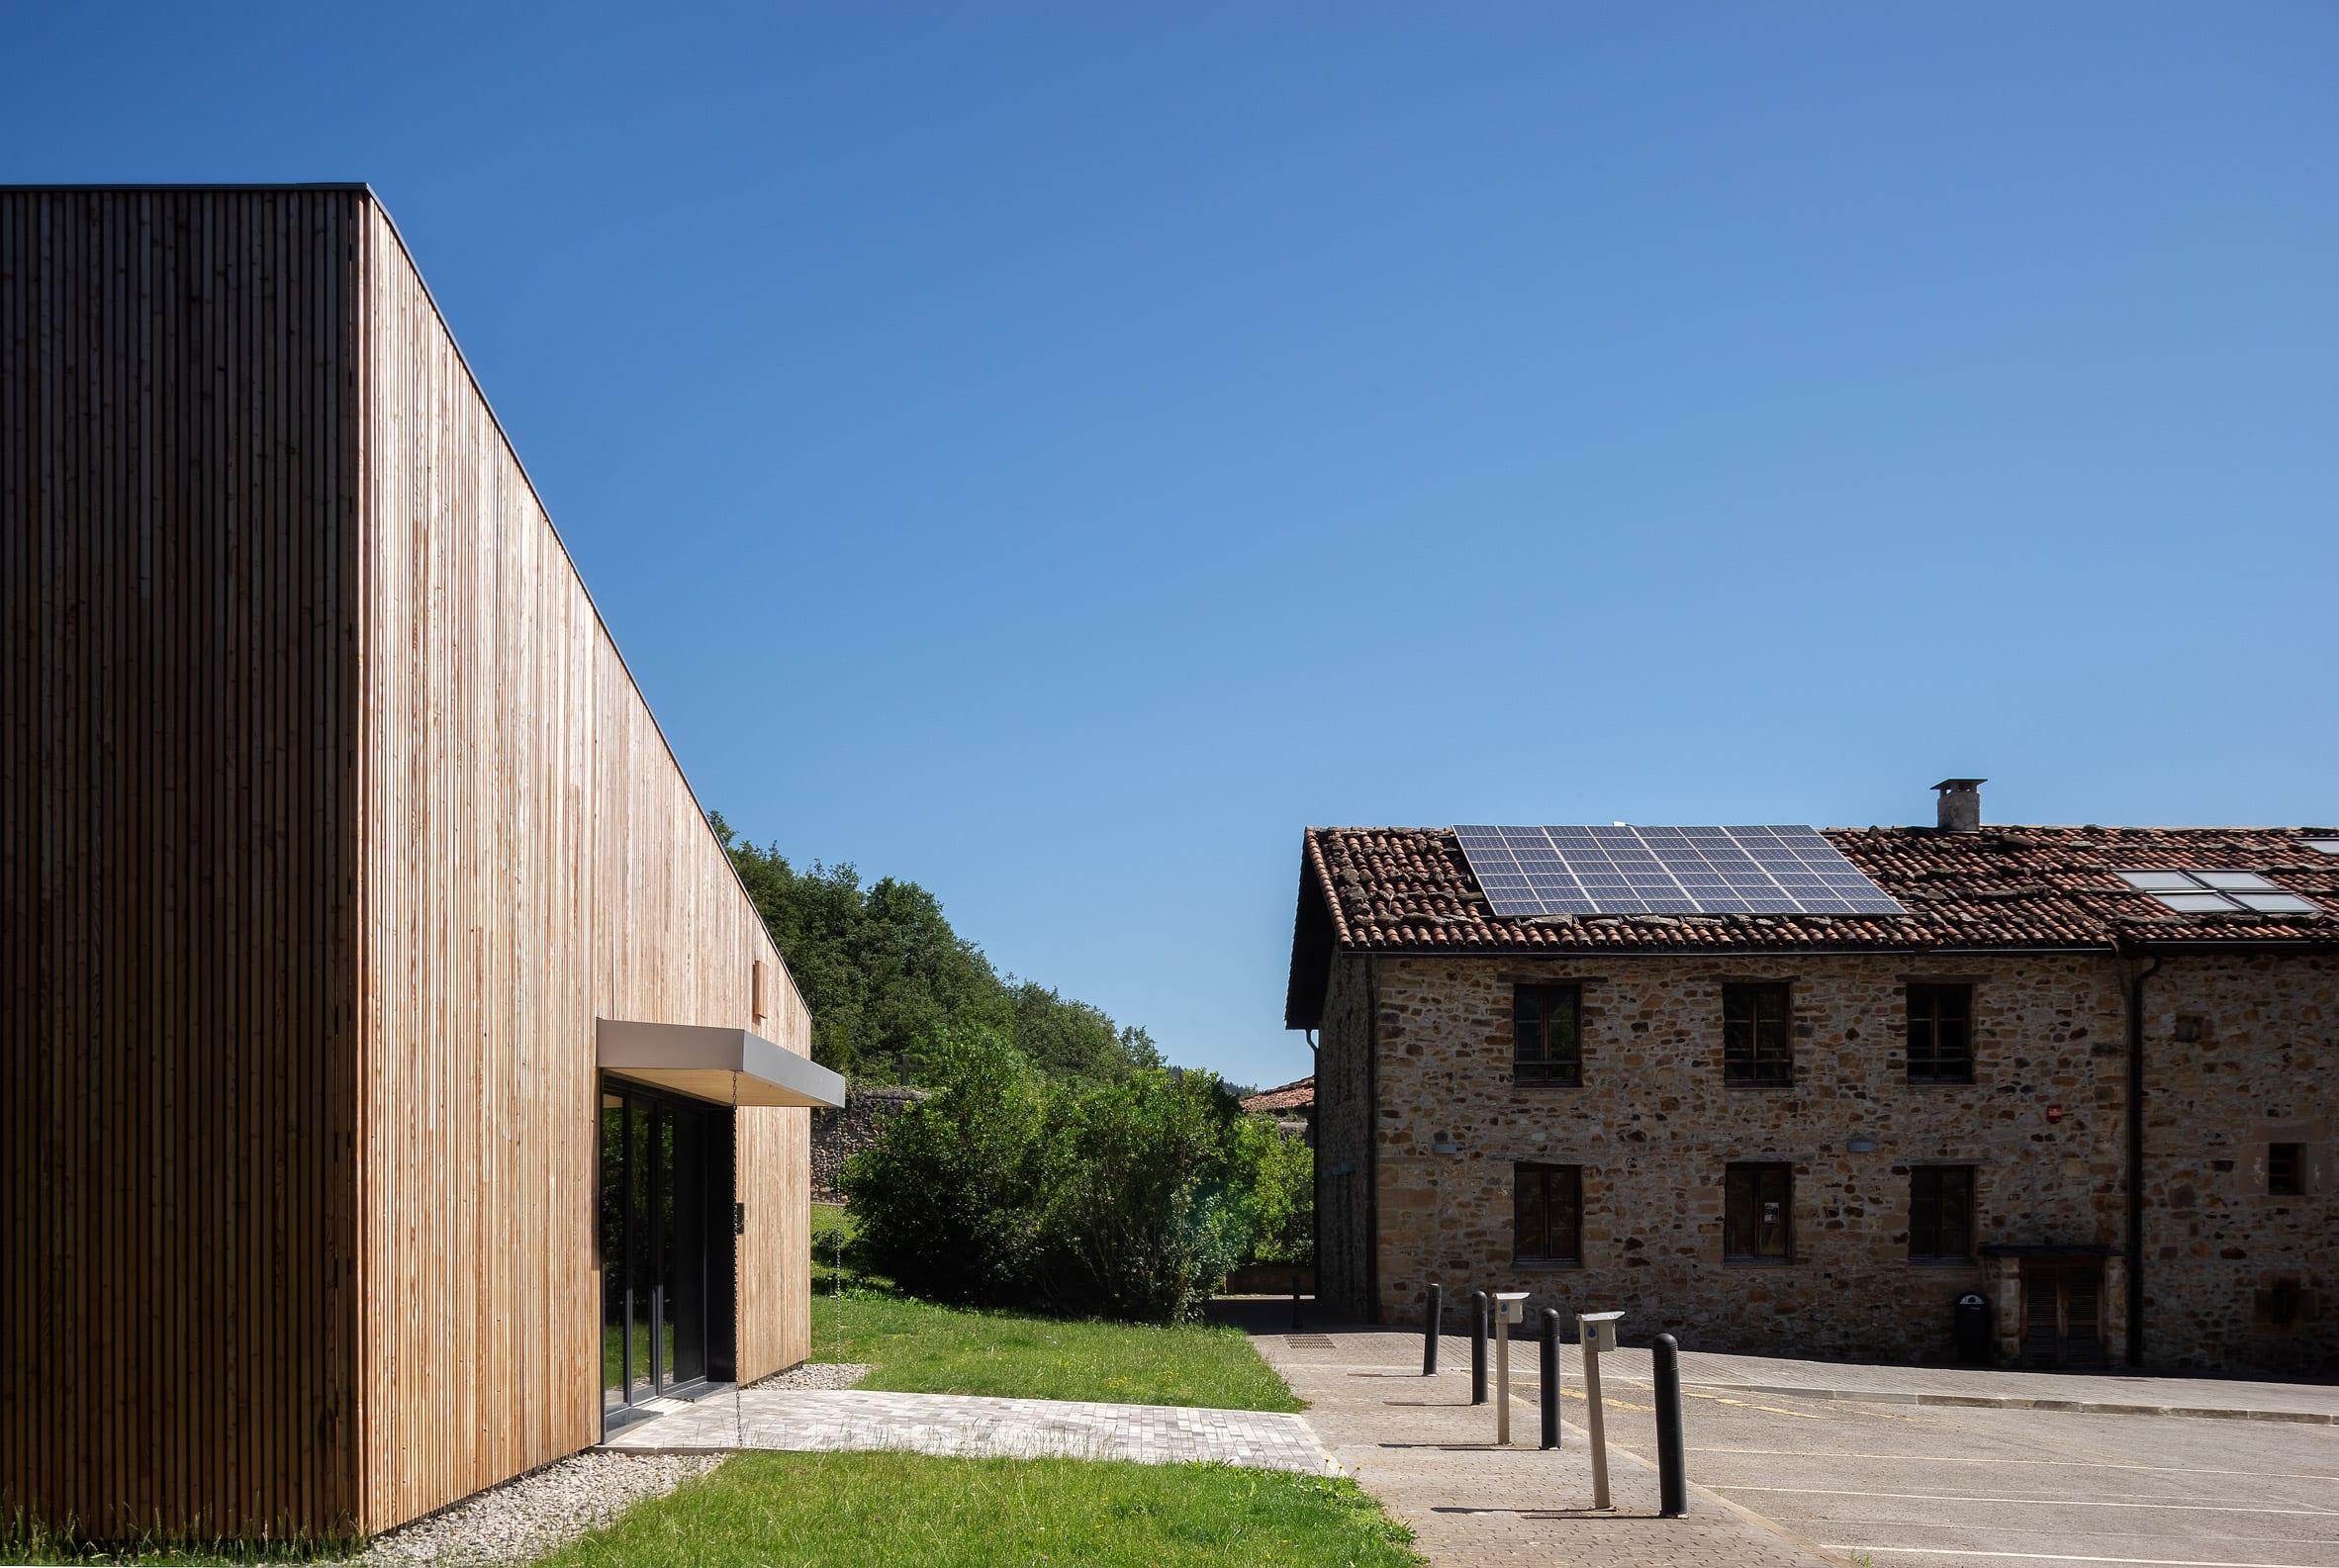 Traditional buildings surround pilgrims house